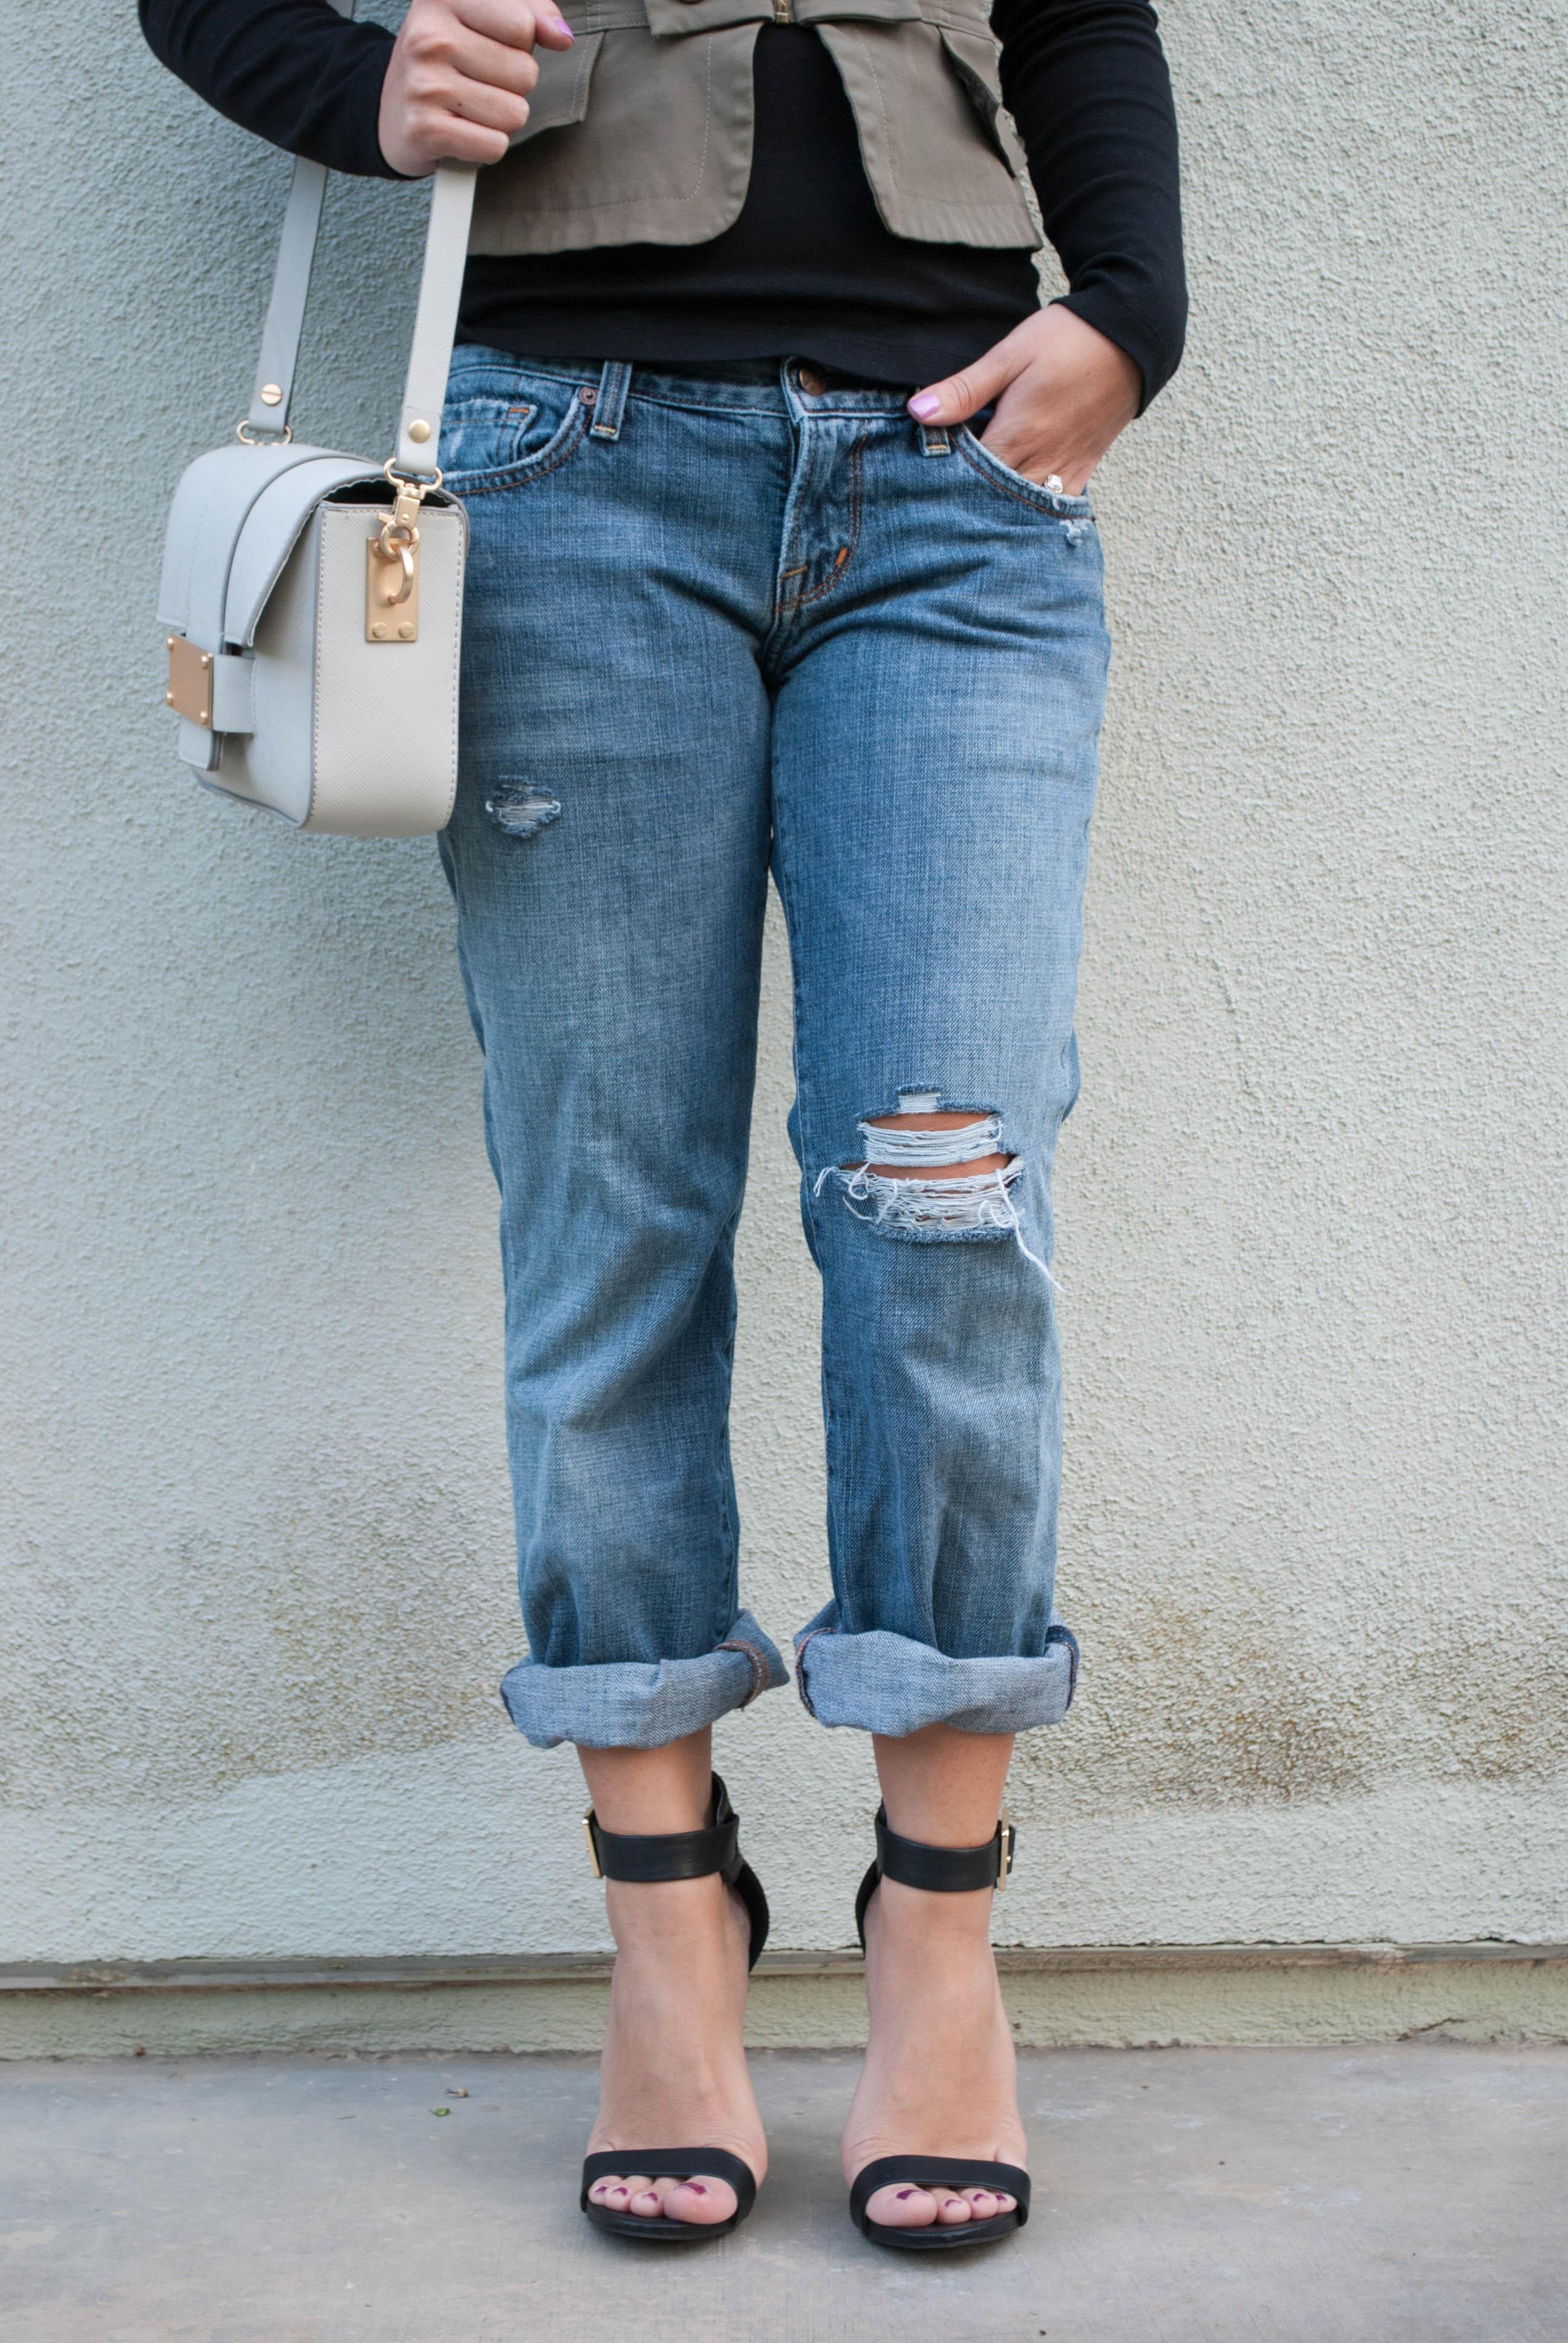 Diy Distressed Boyfriend Jeans In 10 Easy Steps Inspire Me